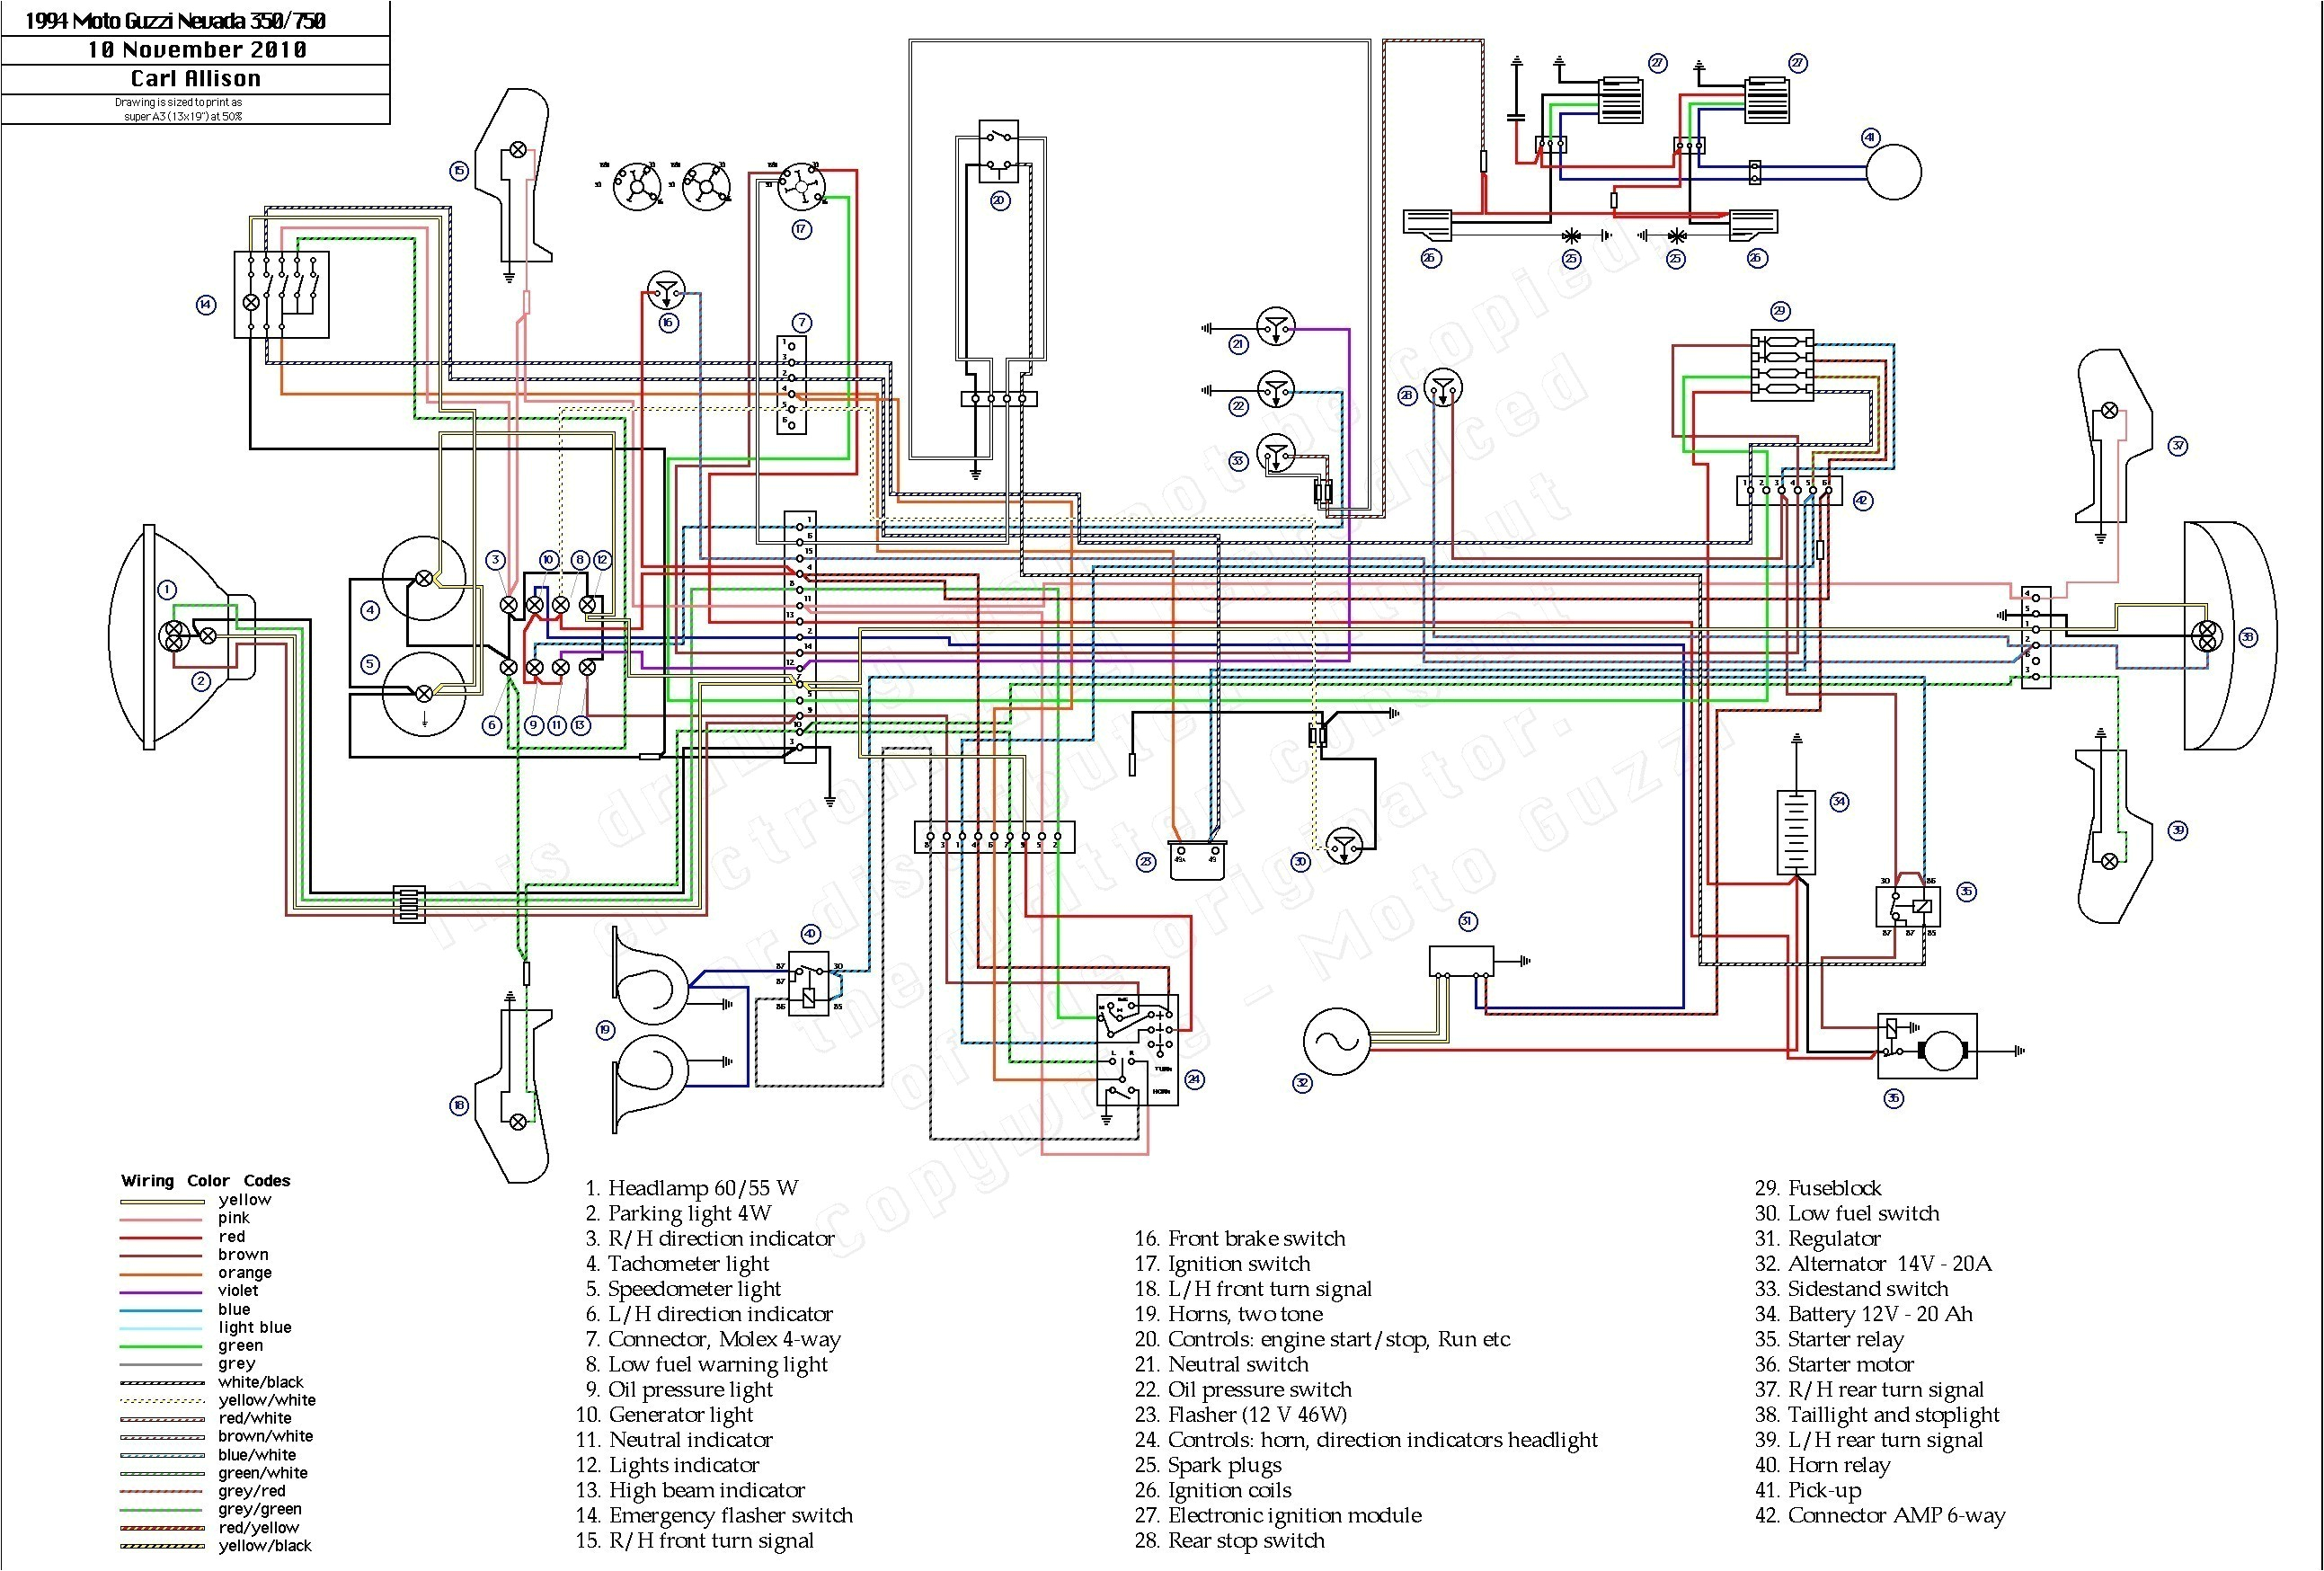 bmw wds wiring colours blog wiring diagram wds bmw wiring diagram system 5 e60 e61